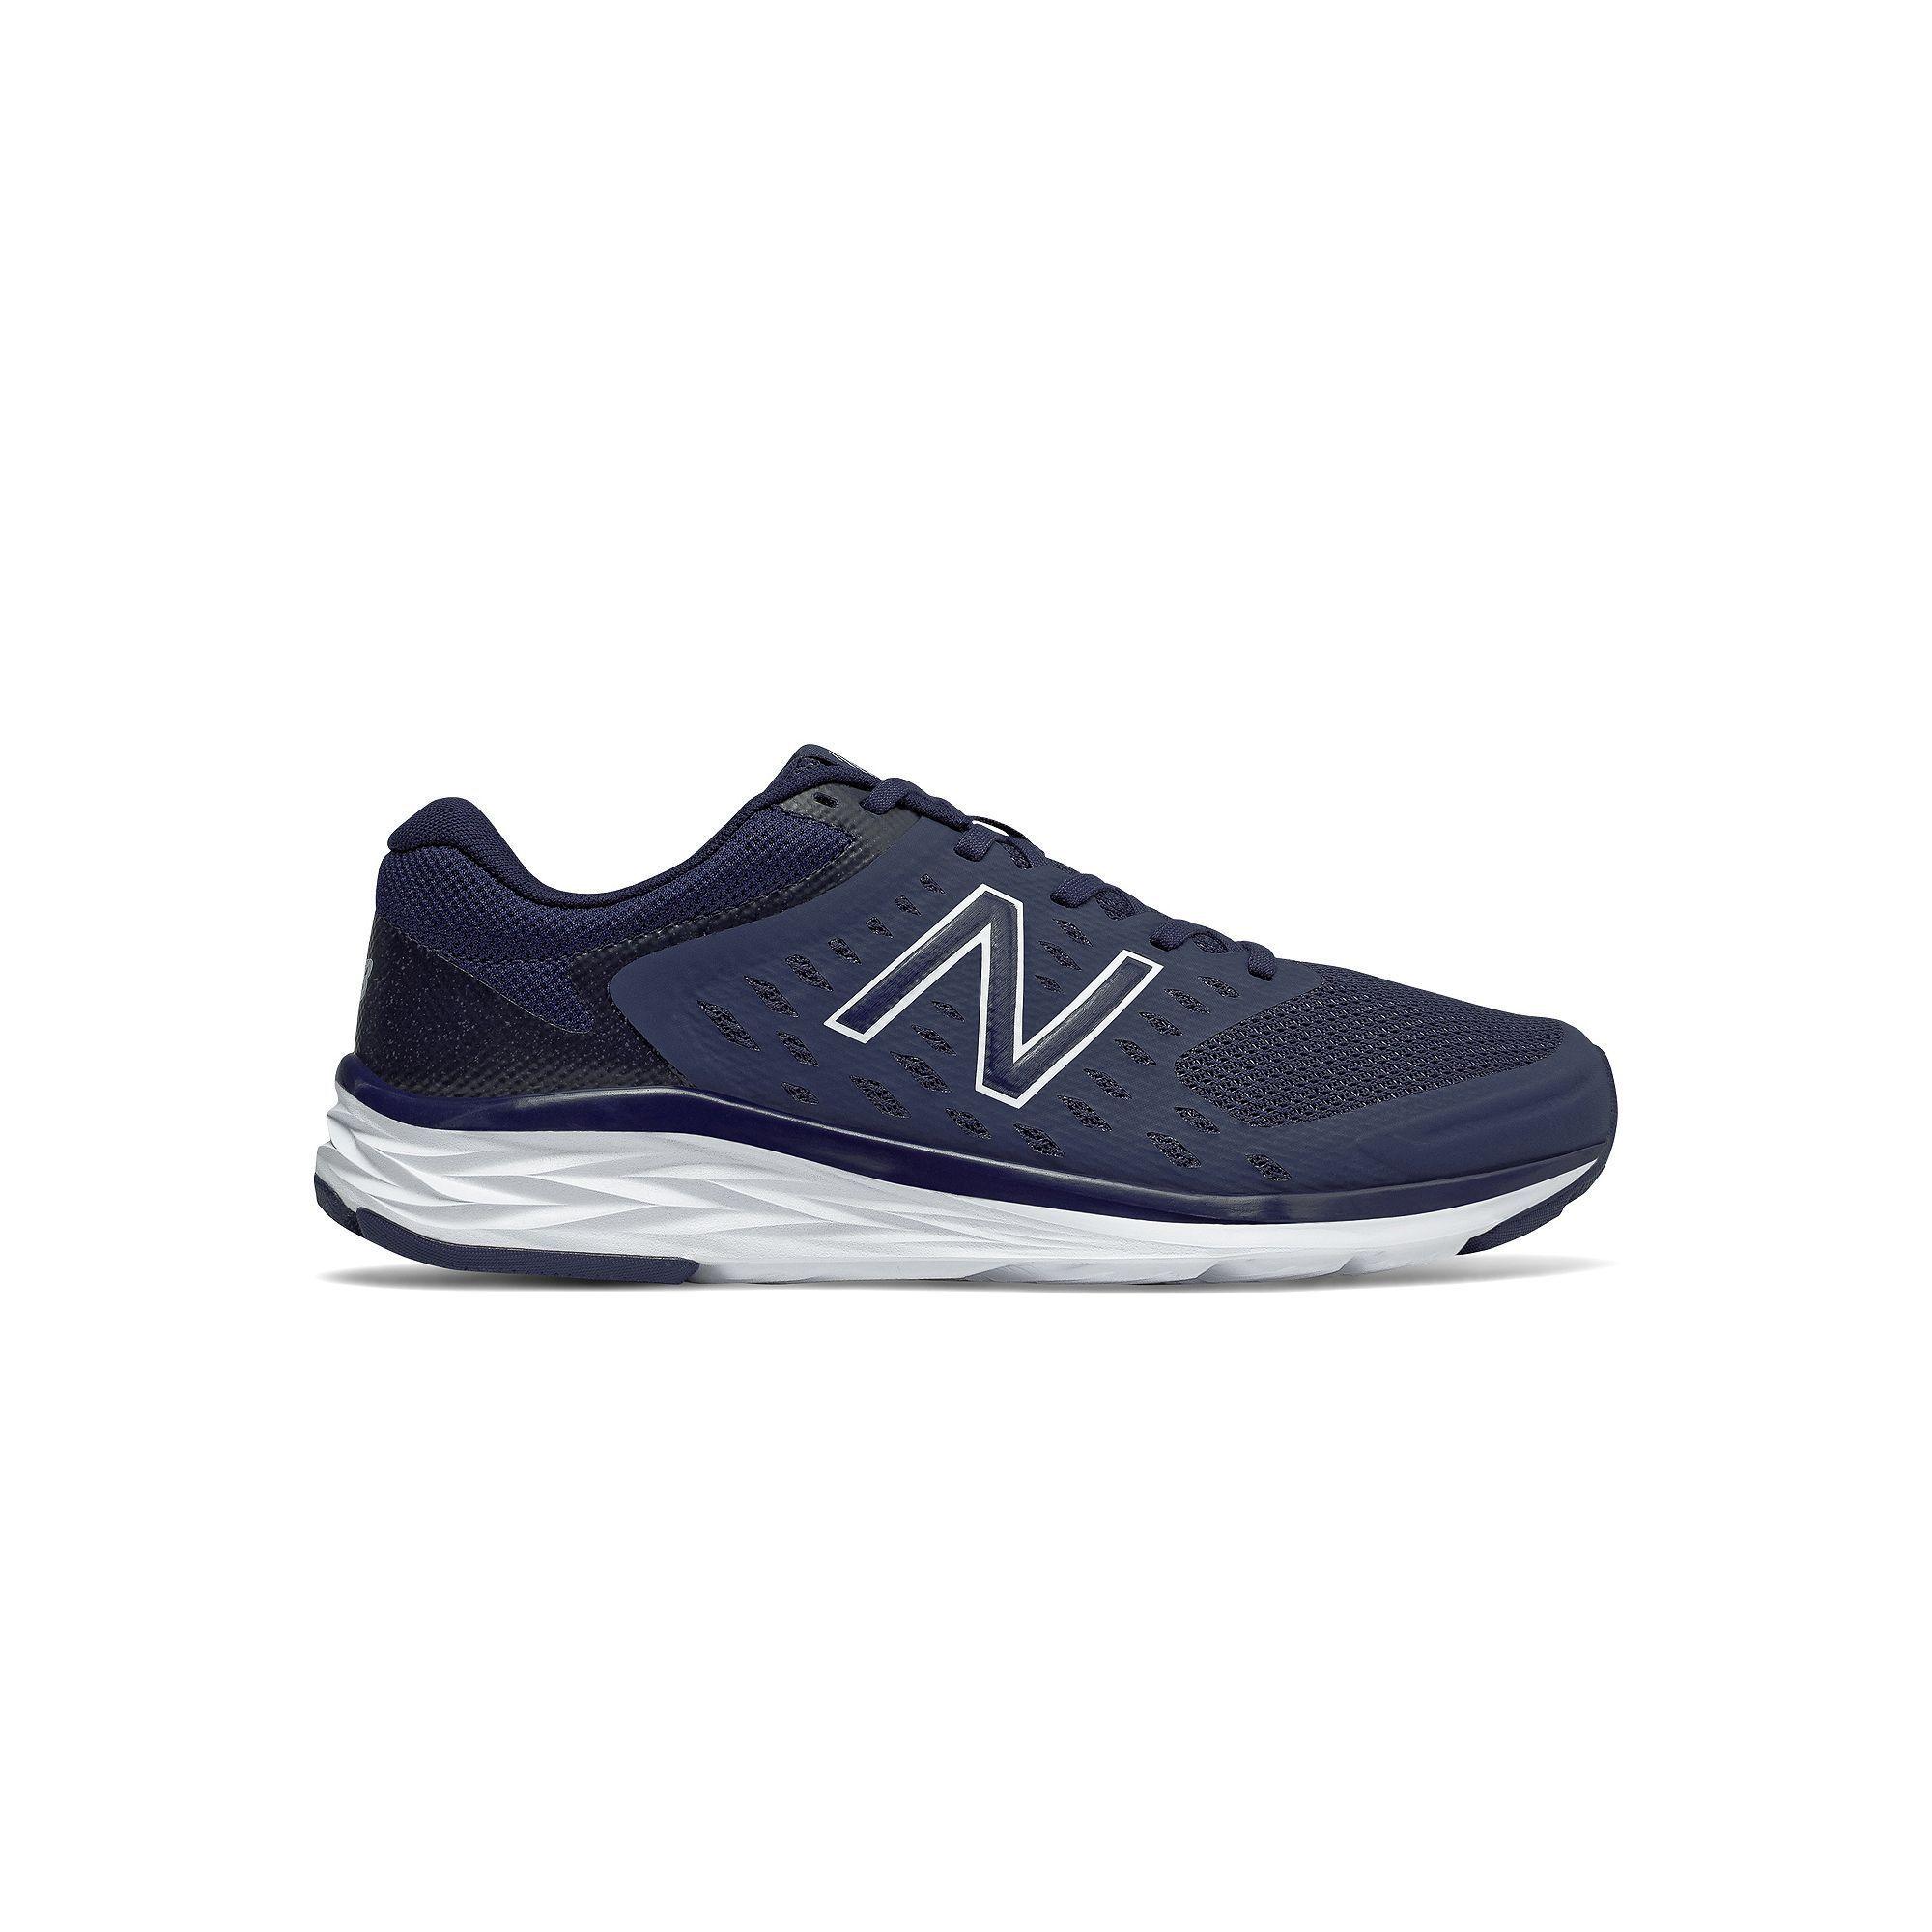 cc12b9bd55293 New Balance 490 v5 Men's Running Shoes, Size: medium (11.5), Brt Blue